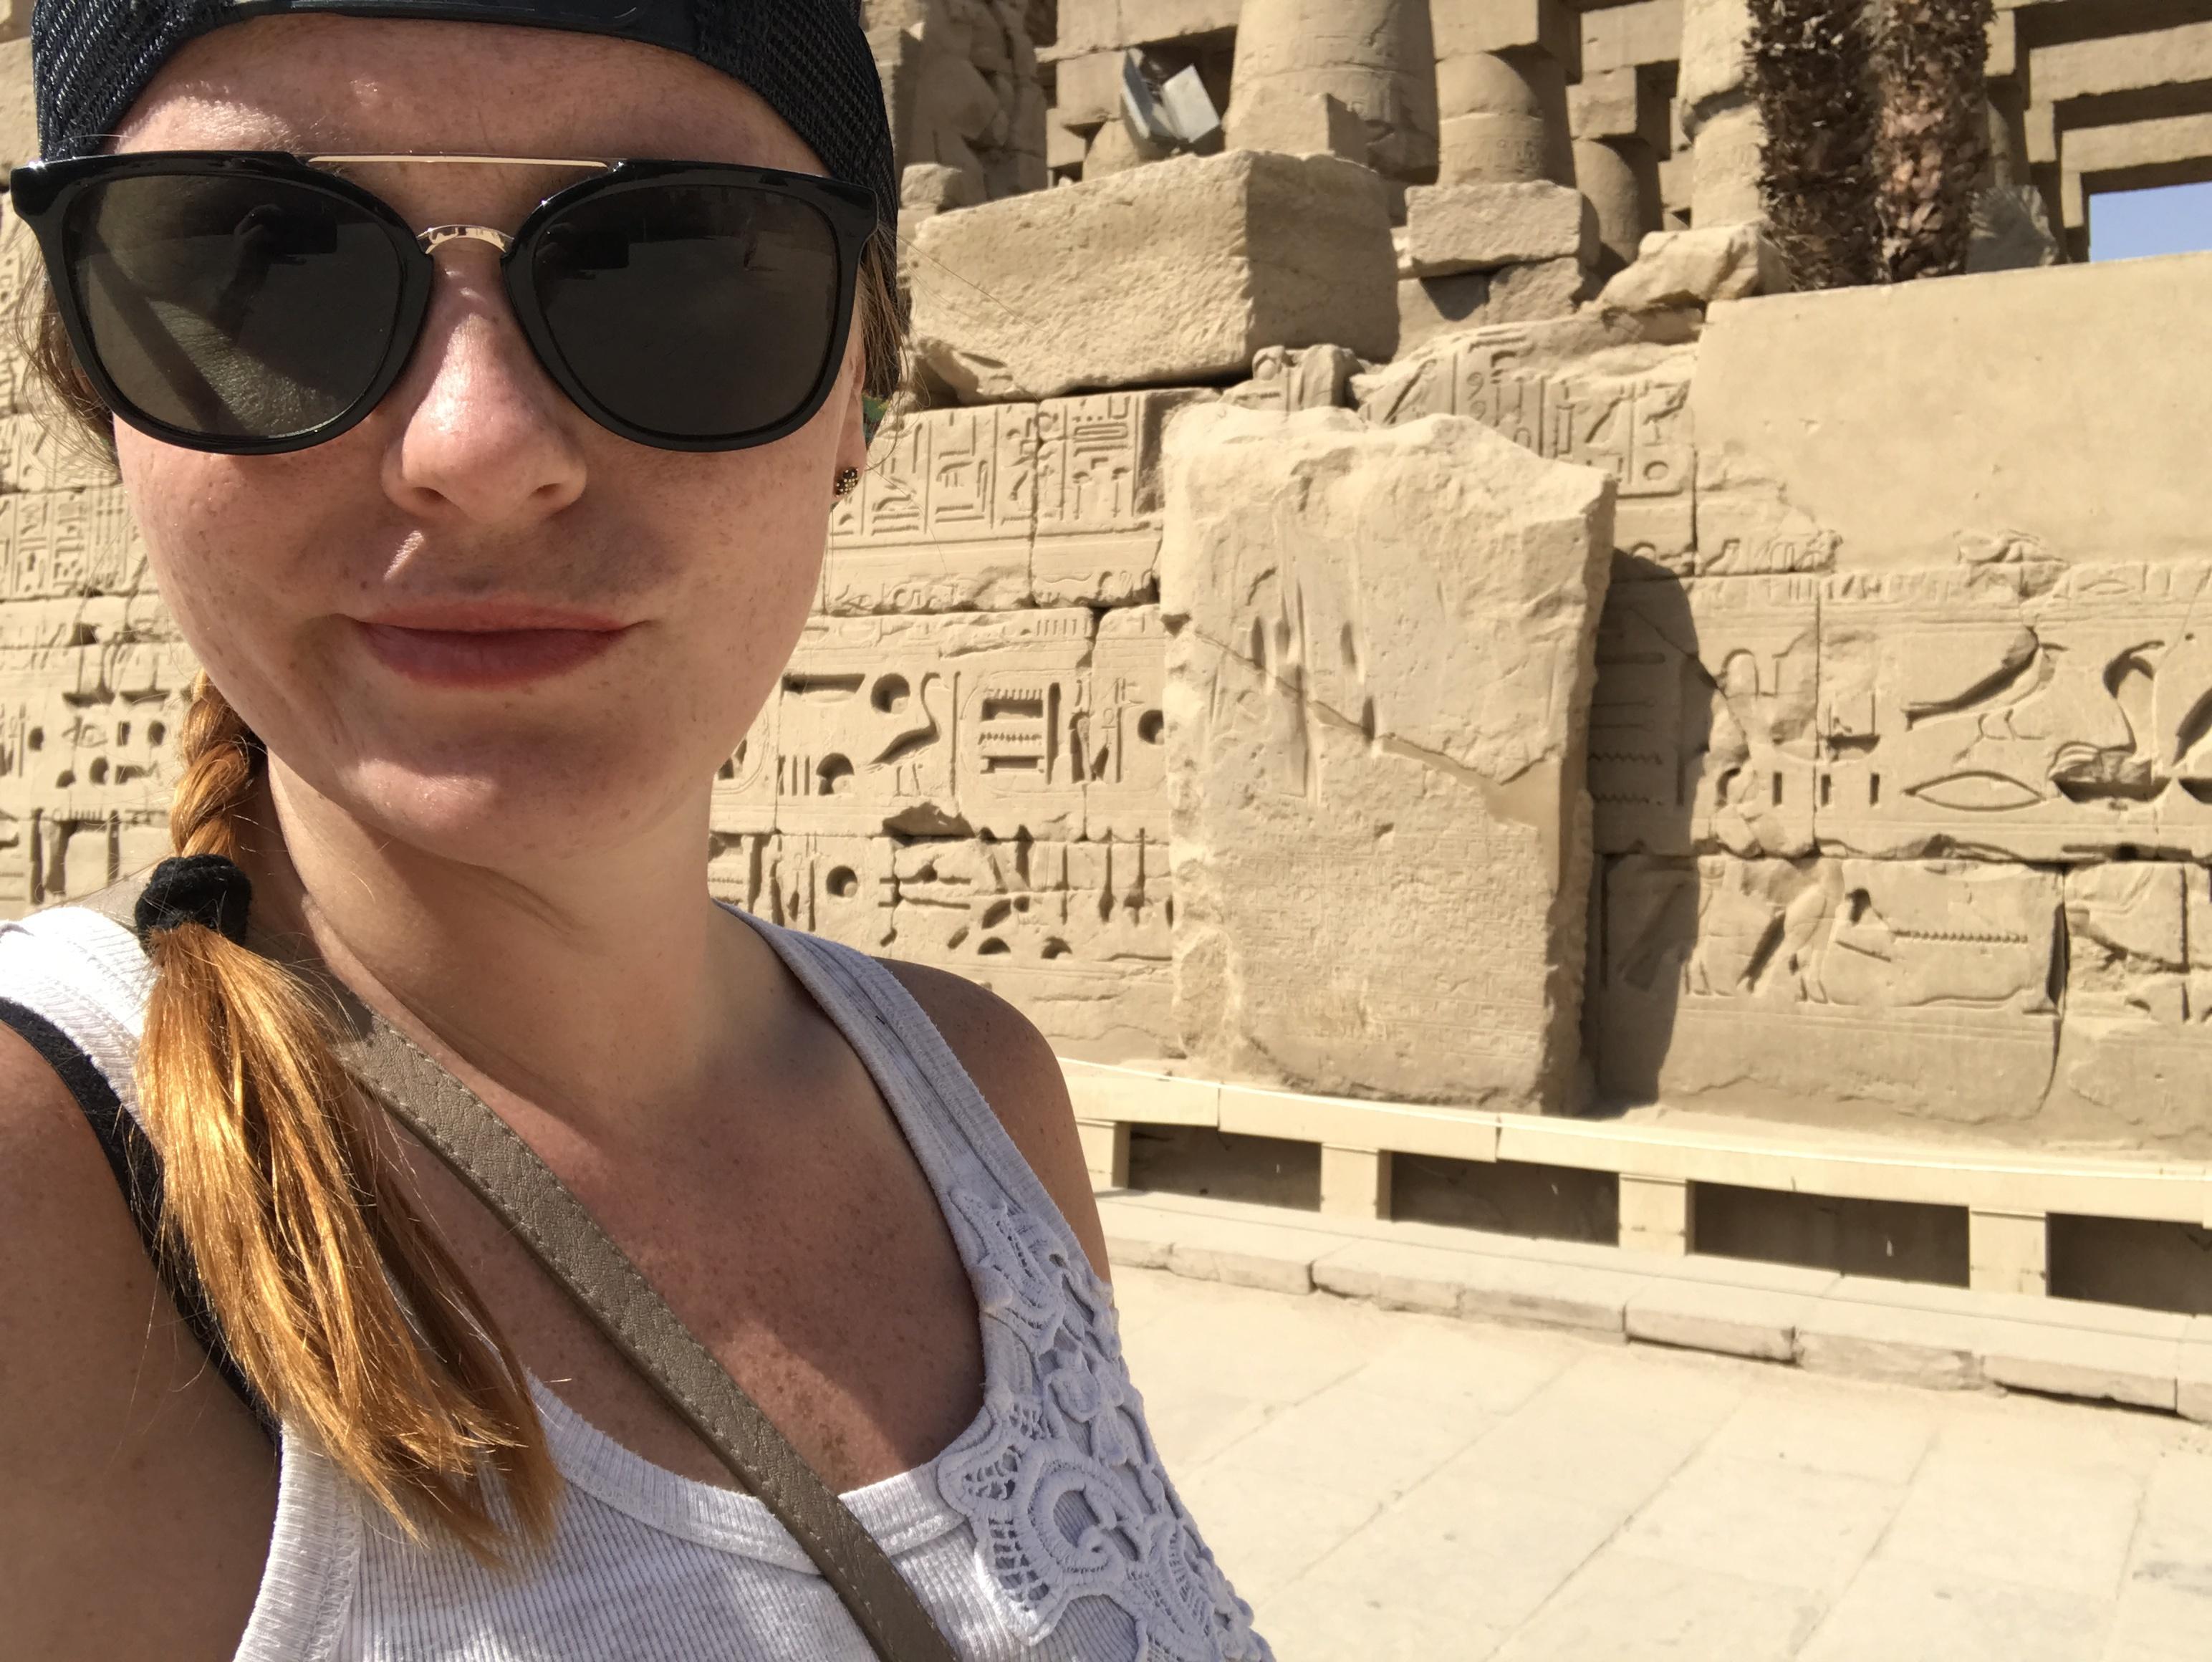 Egypt opalovačka nebo turistika?